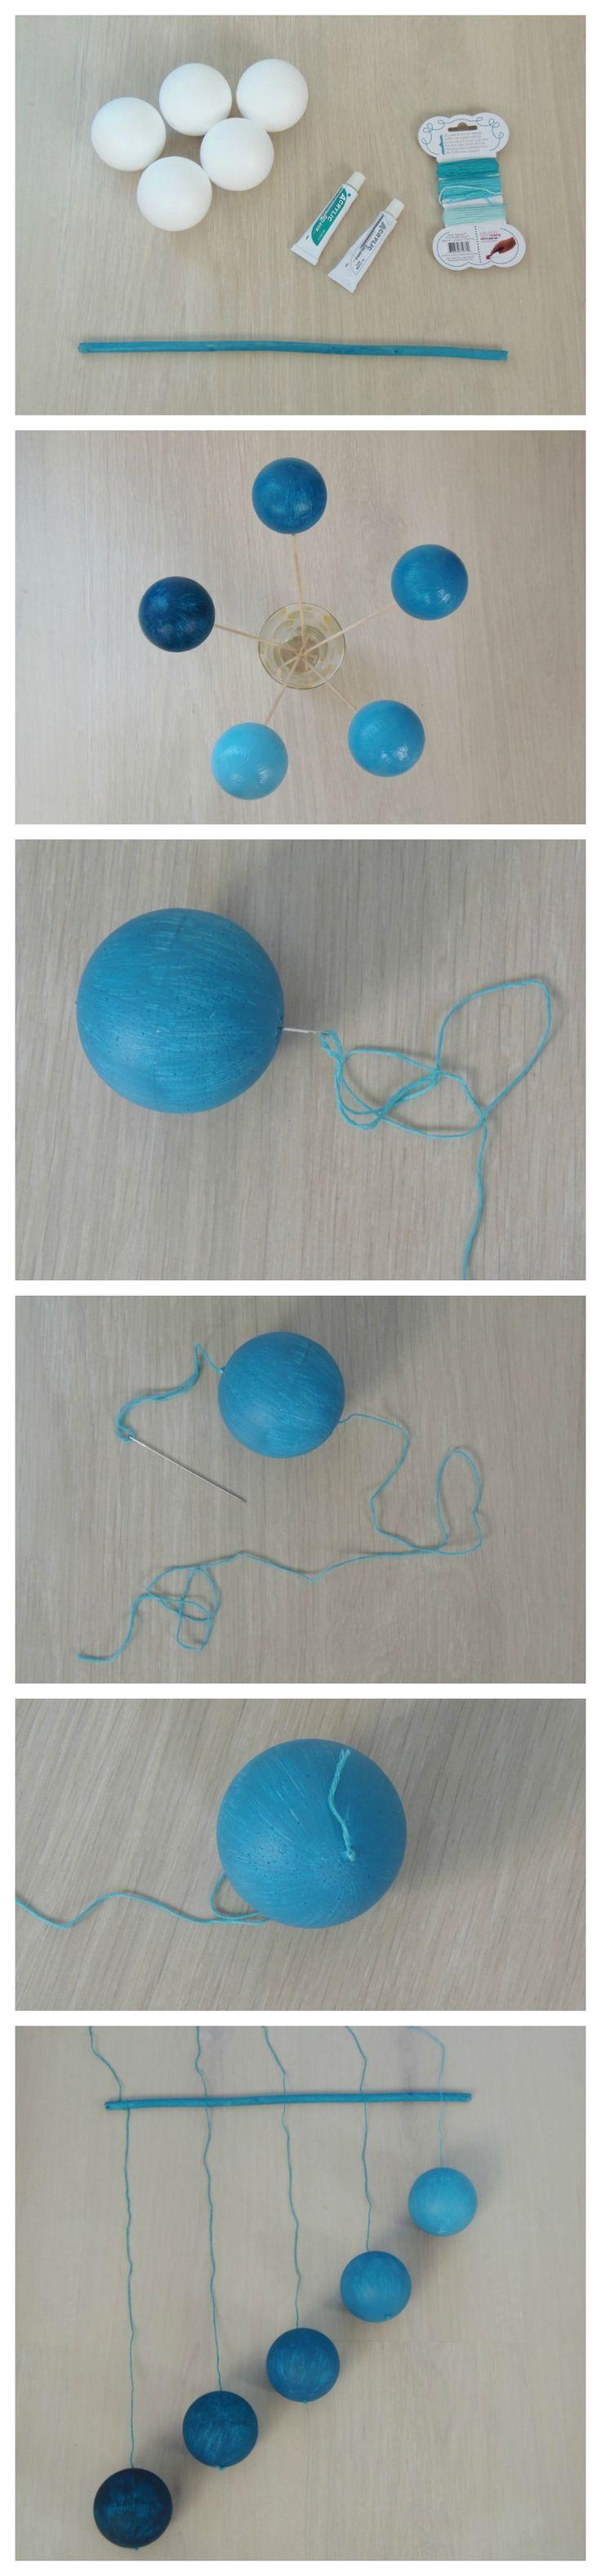 "Móvil de bebé ""Gobbi"" (Tutorial) - DIY ""Gobbi"" baby mobile • Montessori en Casa"